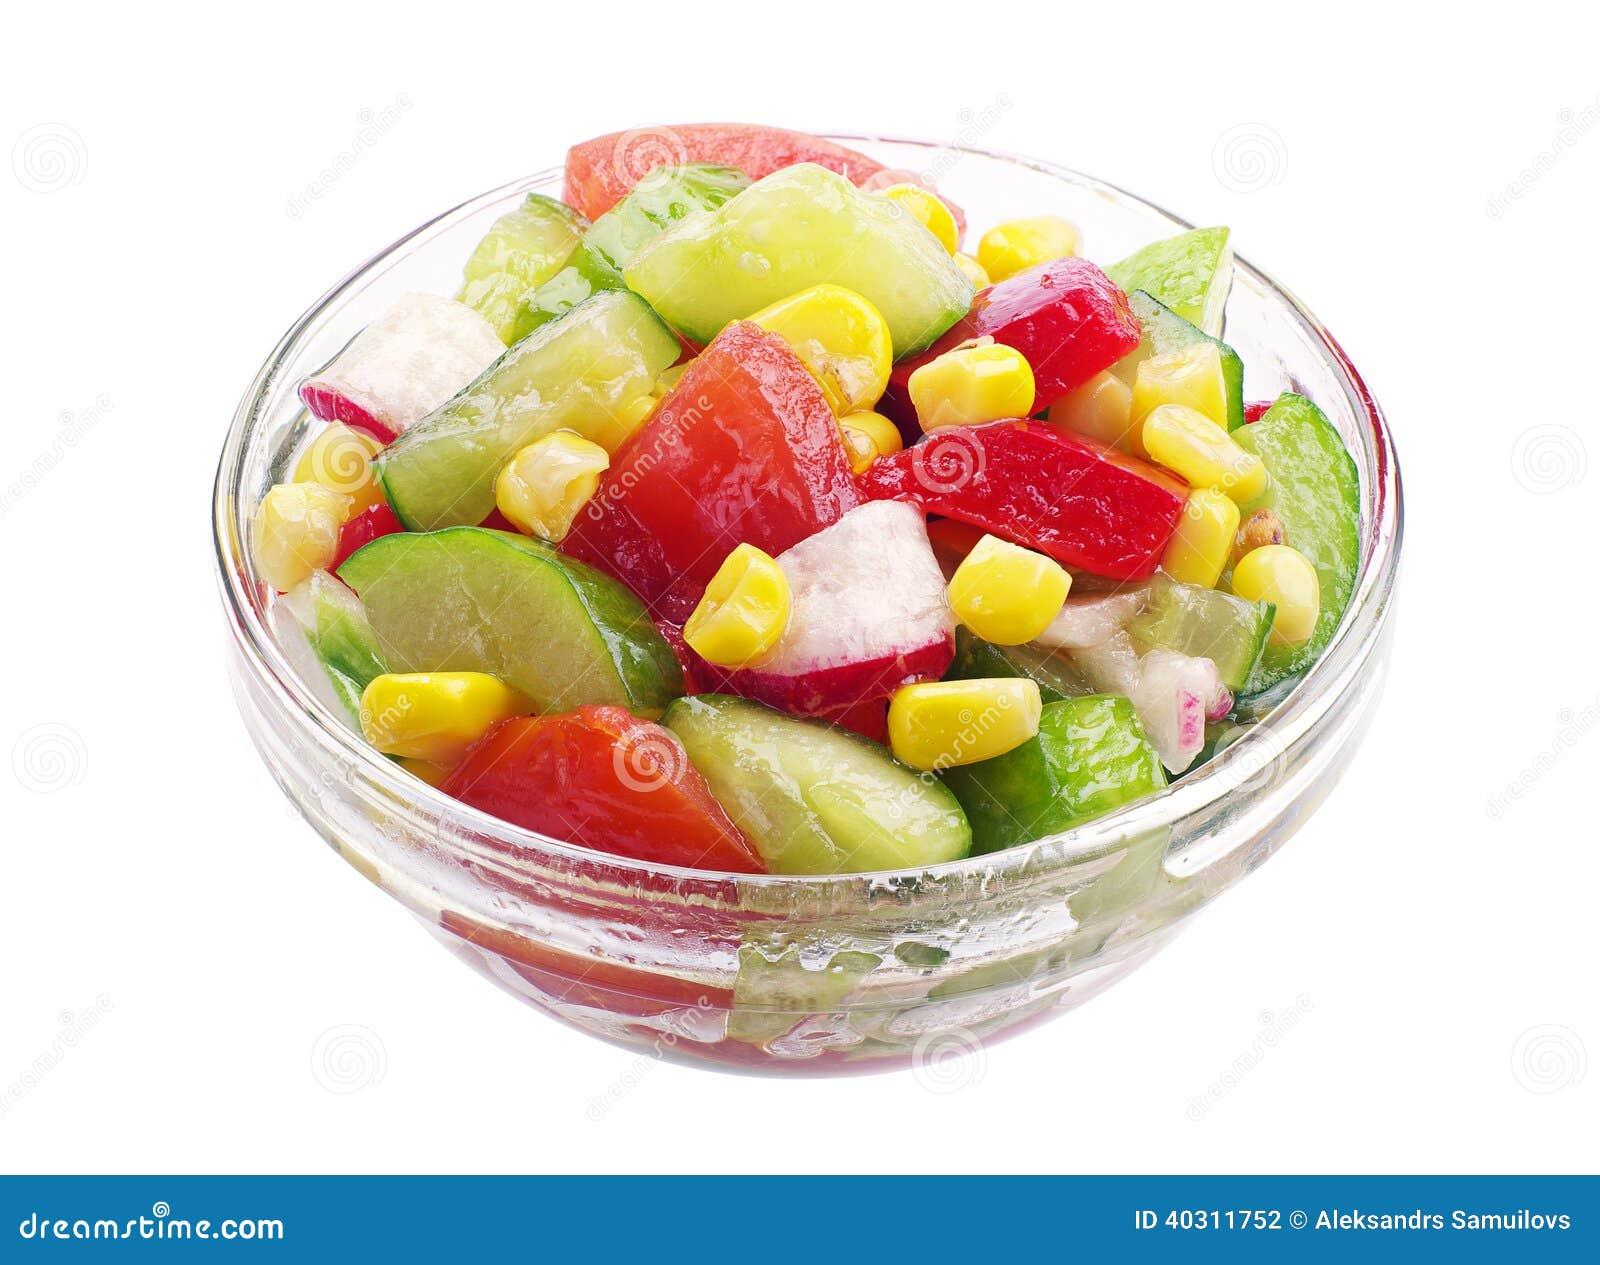 Ensalada vegetal en un bol de vidrio foto de archivo - Bol de vidrio ...